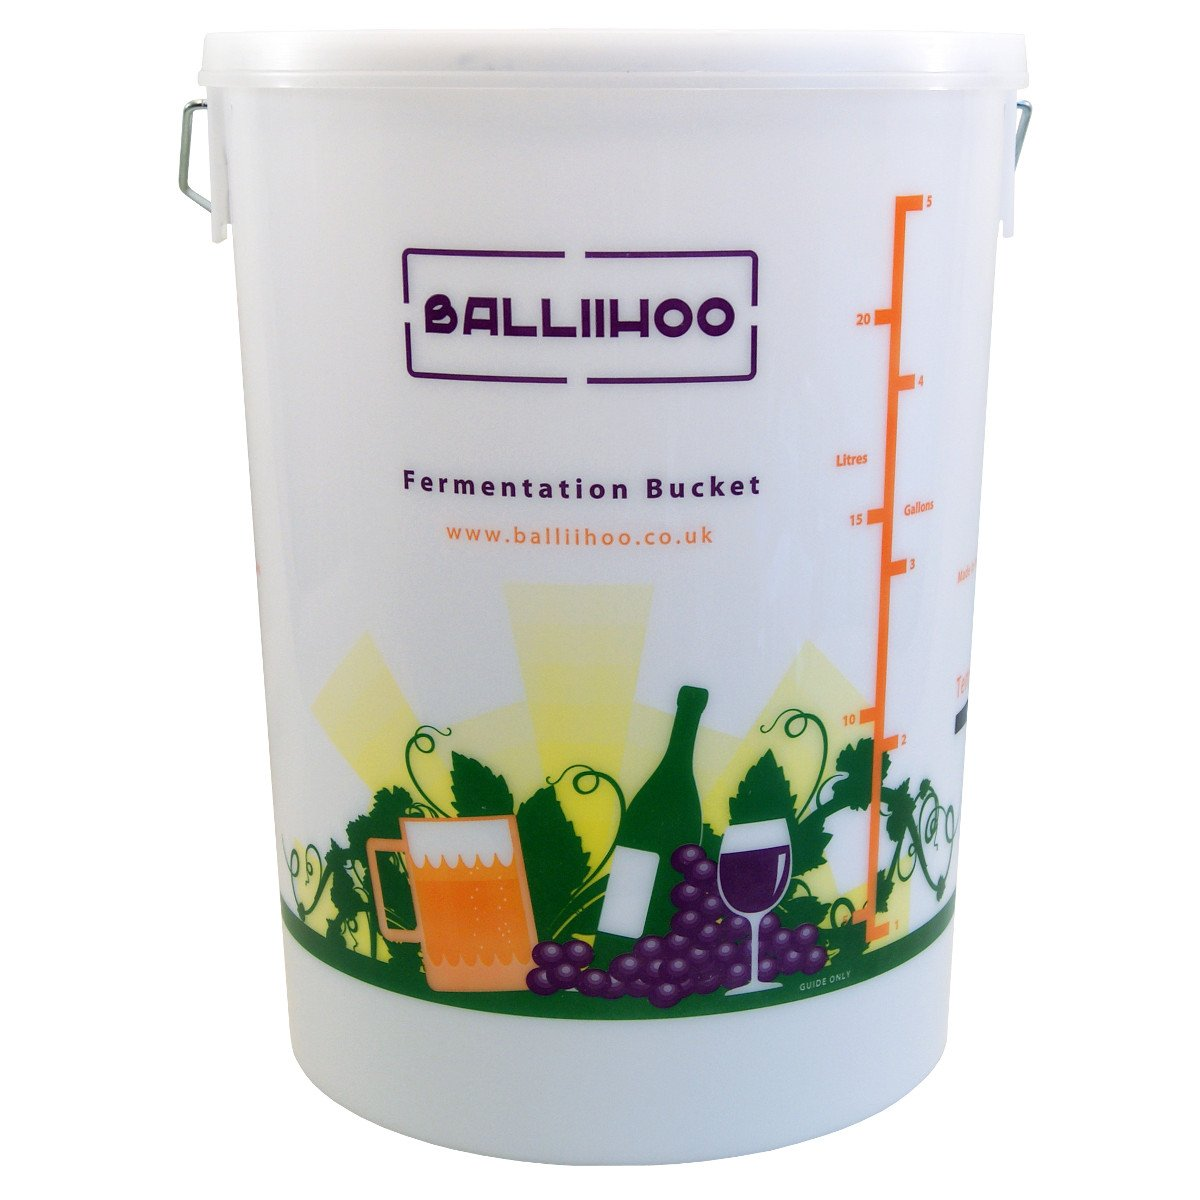 Balliihoo® 5 Gallon/25 Litre Fermentation Bucket With LCD Temperature Indicator Balliihoo Homebrew